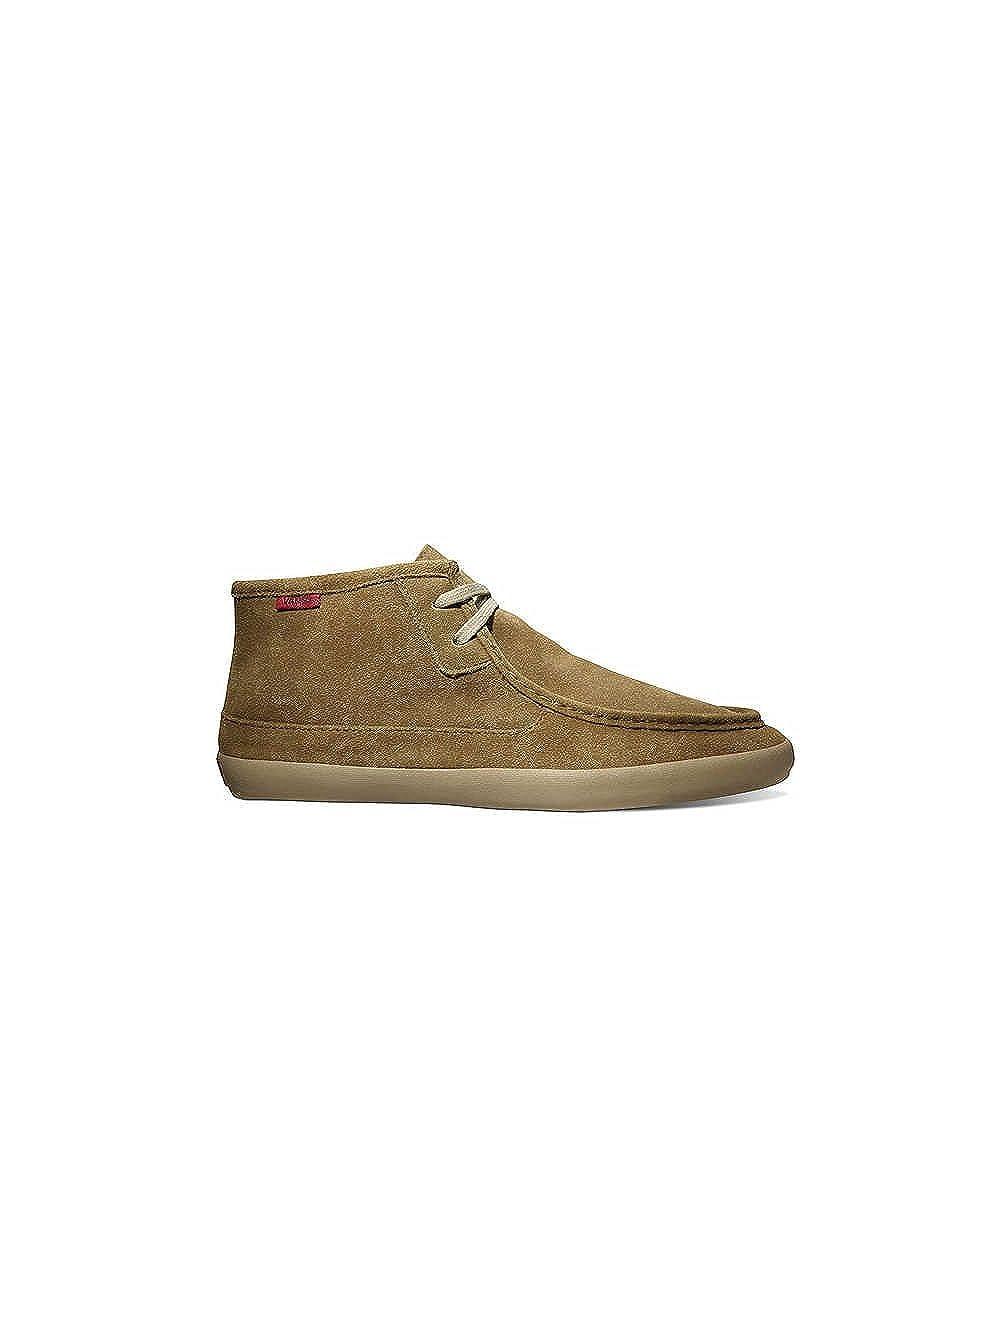 18031fe6e4 Vans Rata Mid Shoes (Fleece) Olive Khaki Mens Sz 7  Amazon.ca  Shoes    Handbags